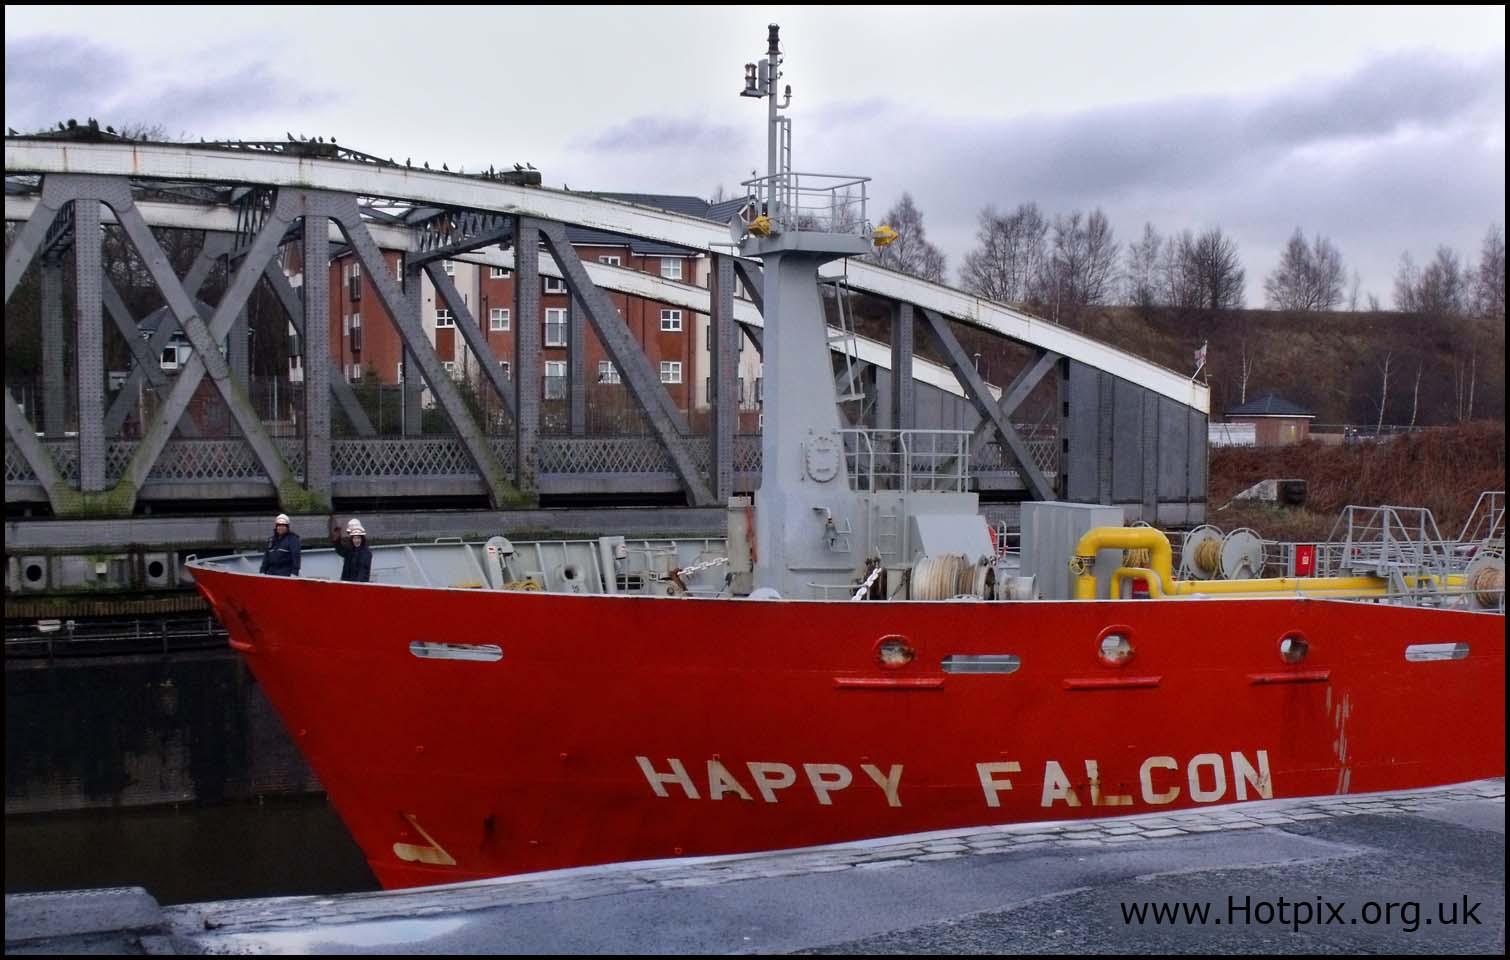 latchford,warrington,cheshire,england,uK,grappenhall,GB,boat,ship,red,hull,swing,bridge,manchester,canal,lock,happy,falcon,LPG,Tanker,IMO,9227261,Flag,IOM,Built,2002,3366gt,winter,january,2010,22/01/2010,01/22/2010,baot,schip,Hotpicks,hotpics,hot,pics,pix,picks,highway,road,hotpix.freeserve.co.uk,hotpix!,hotpix.rocketmail.com,hotpixuk.rocketmail.com,contact.tony.smith.gmail.com,tony.smith.gmail.com,tonys@miscs.com,tony.smith@mis-ams.com